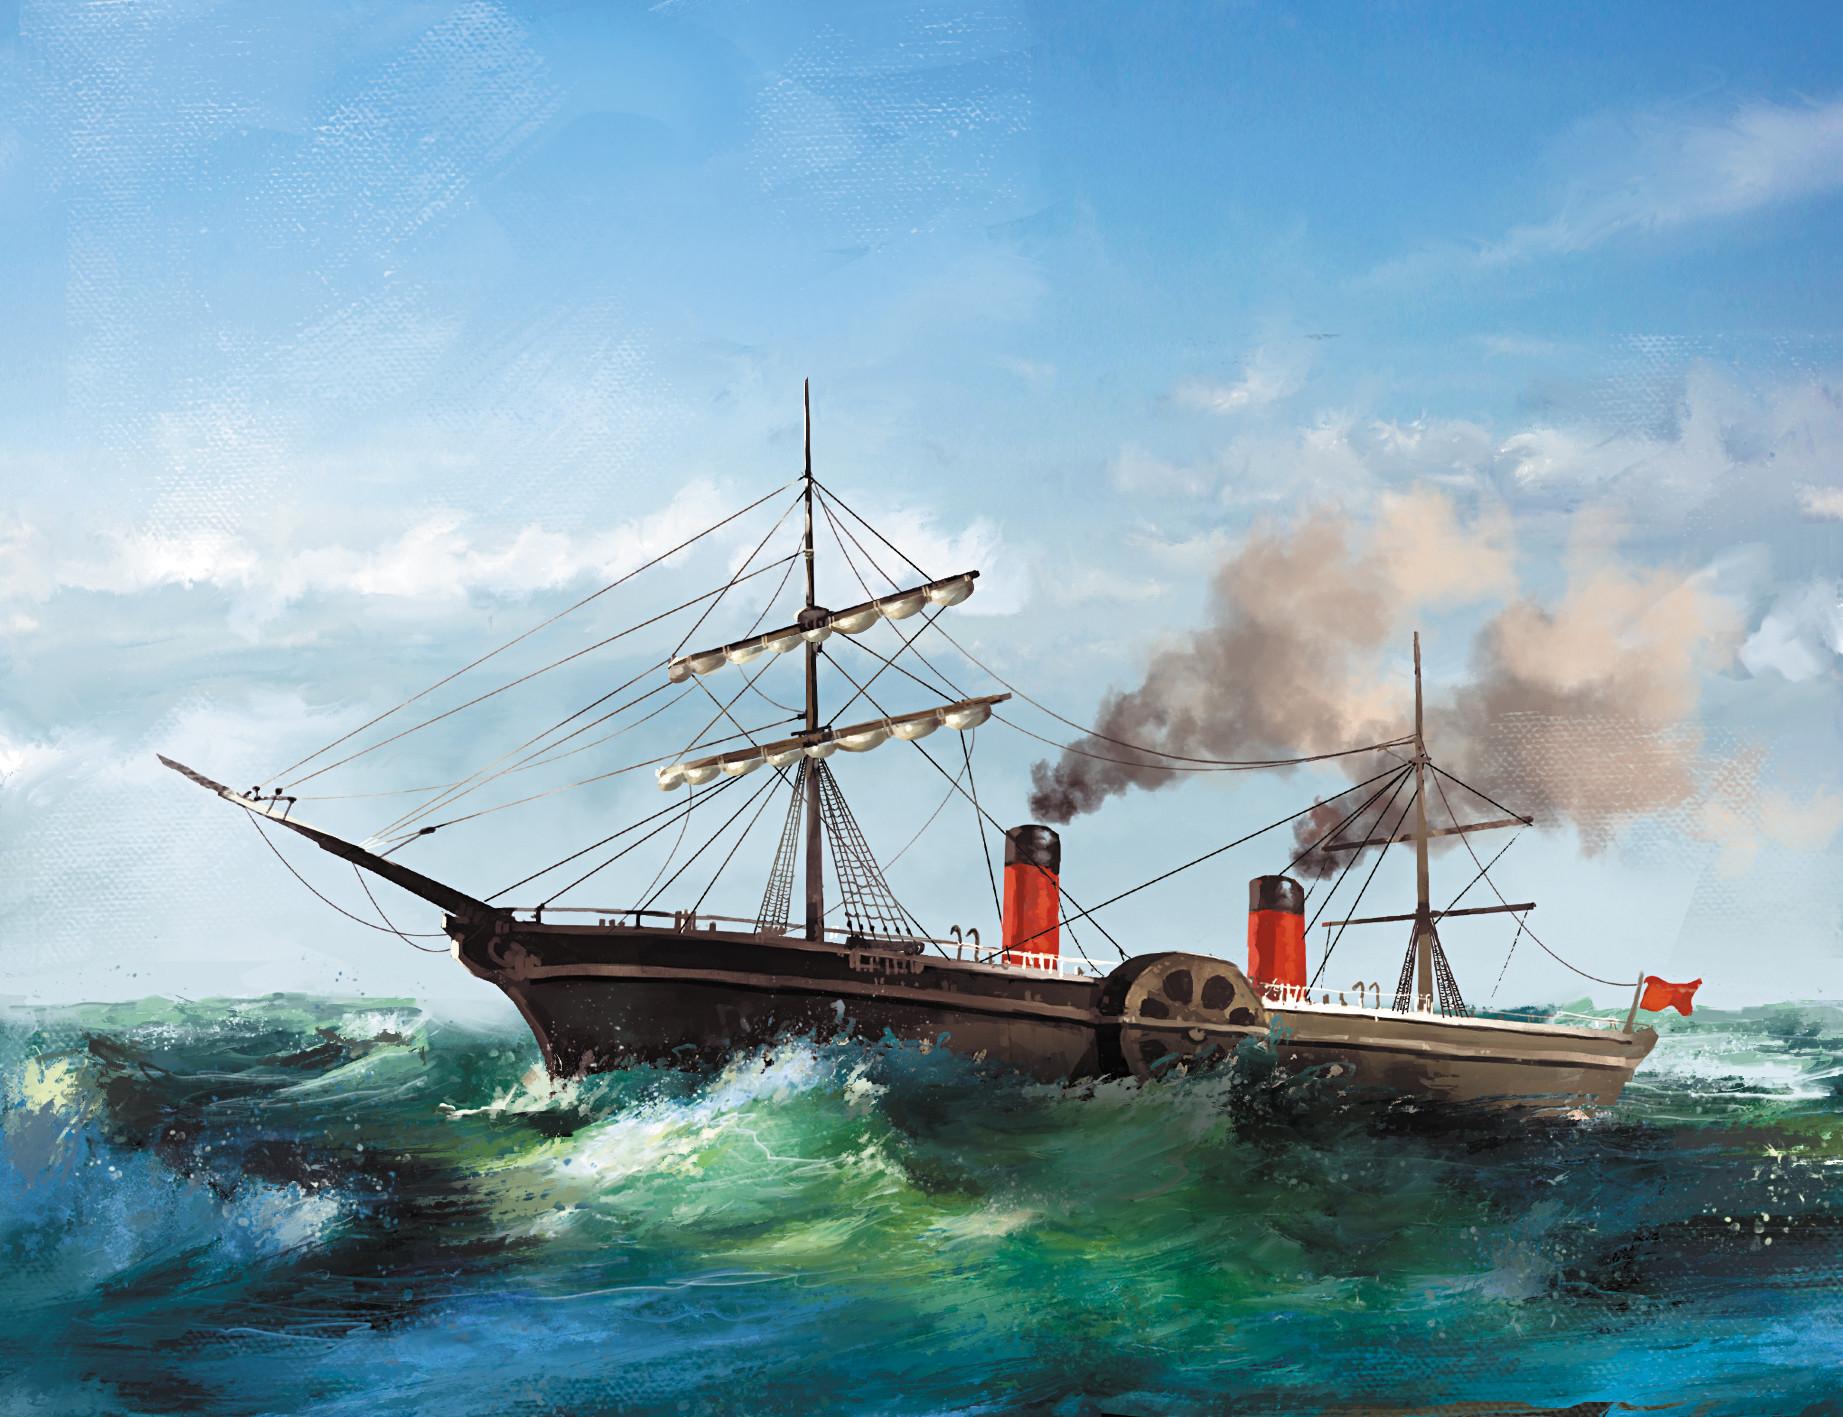 Dominik mayer 1862 scotia 01